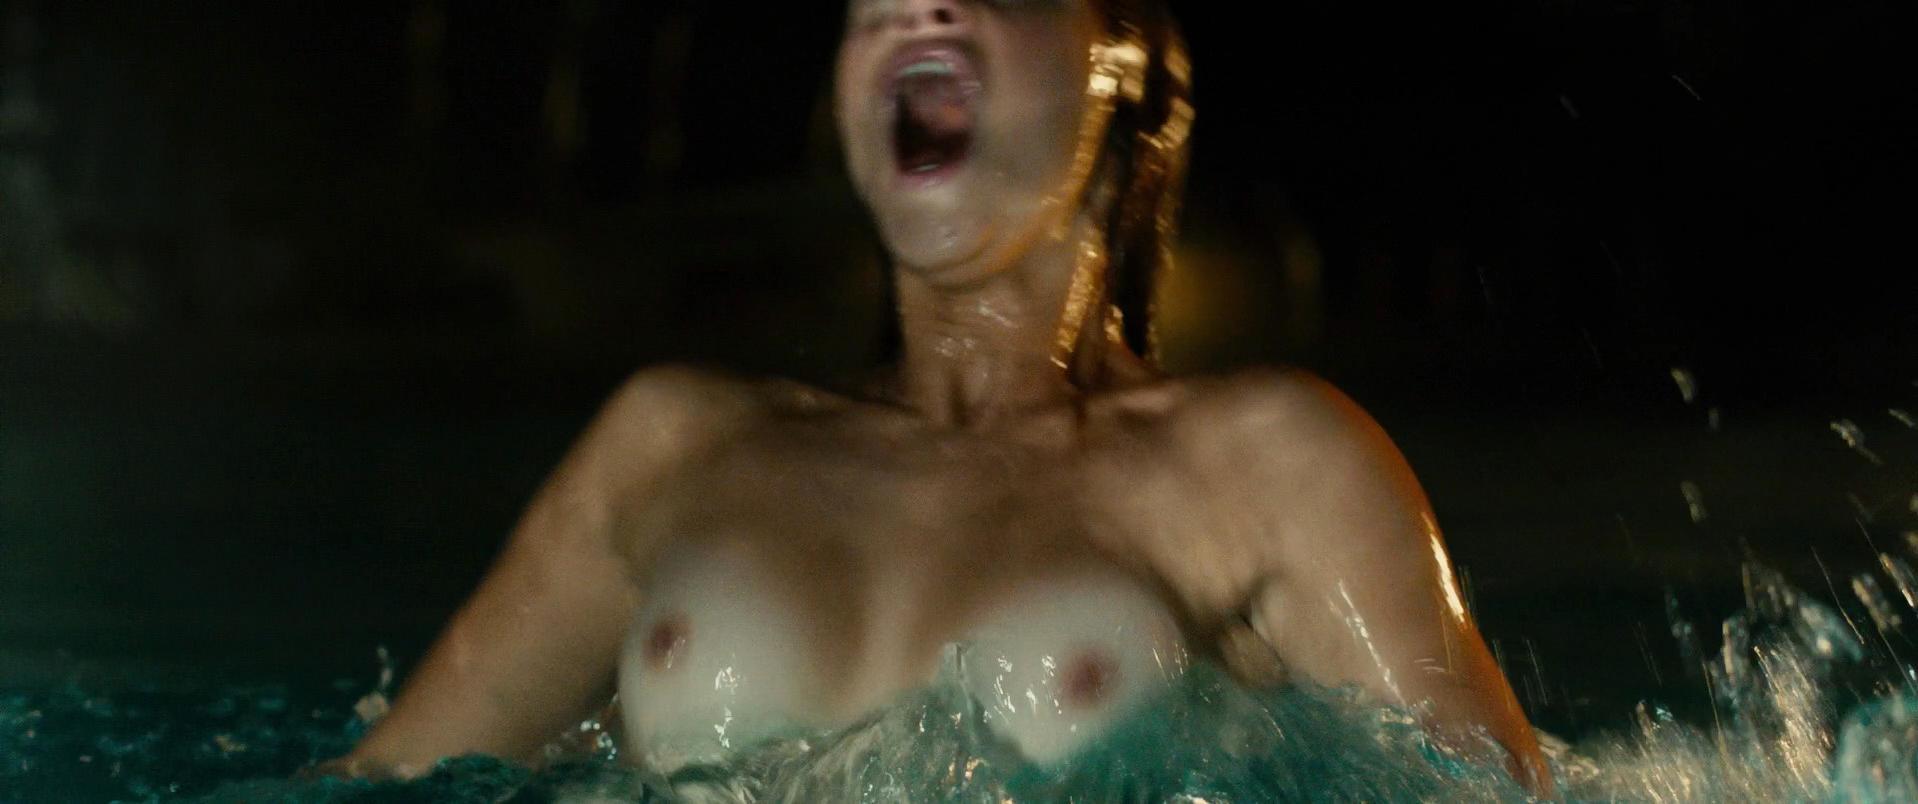 Nicole Fox nude - Girlhouse (2014)